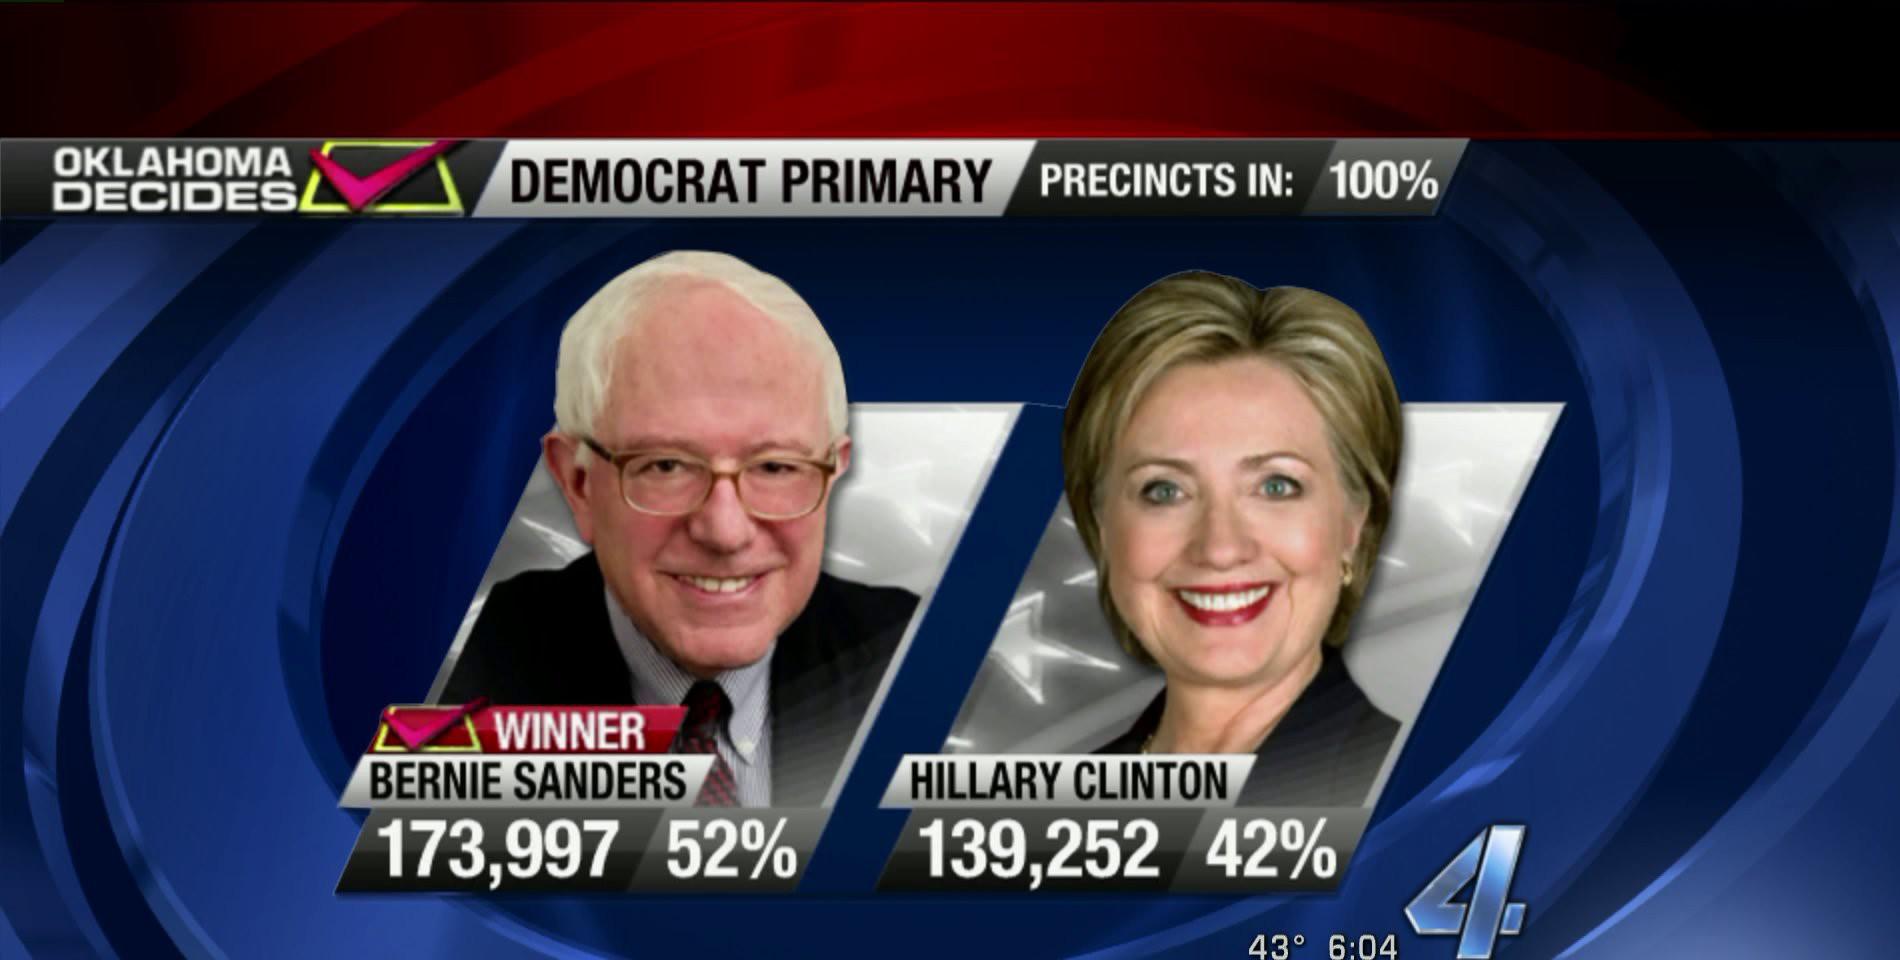 Democrat primary results in Oklahoma